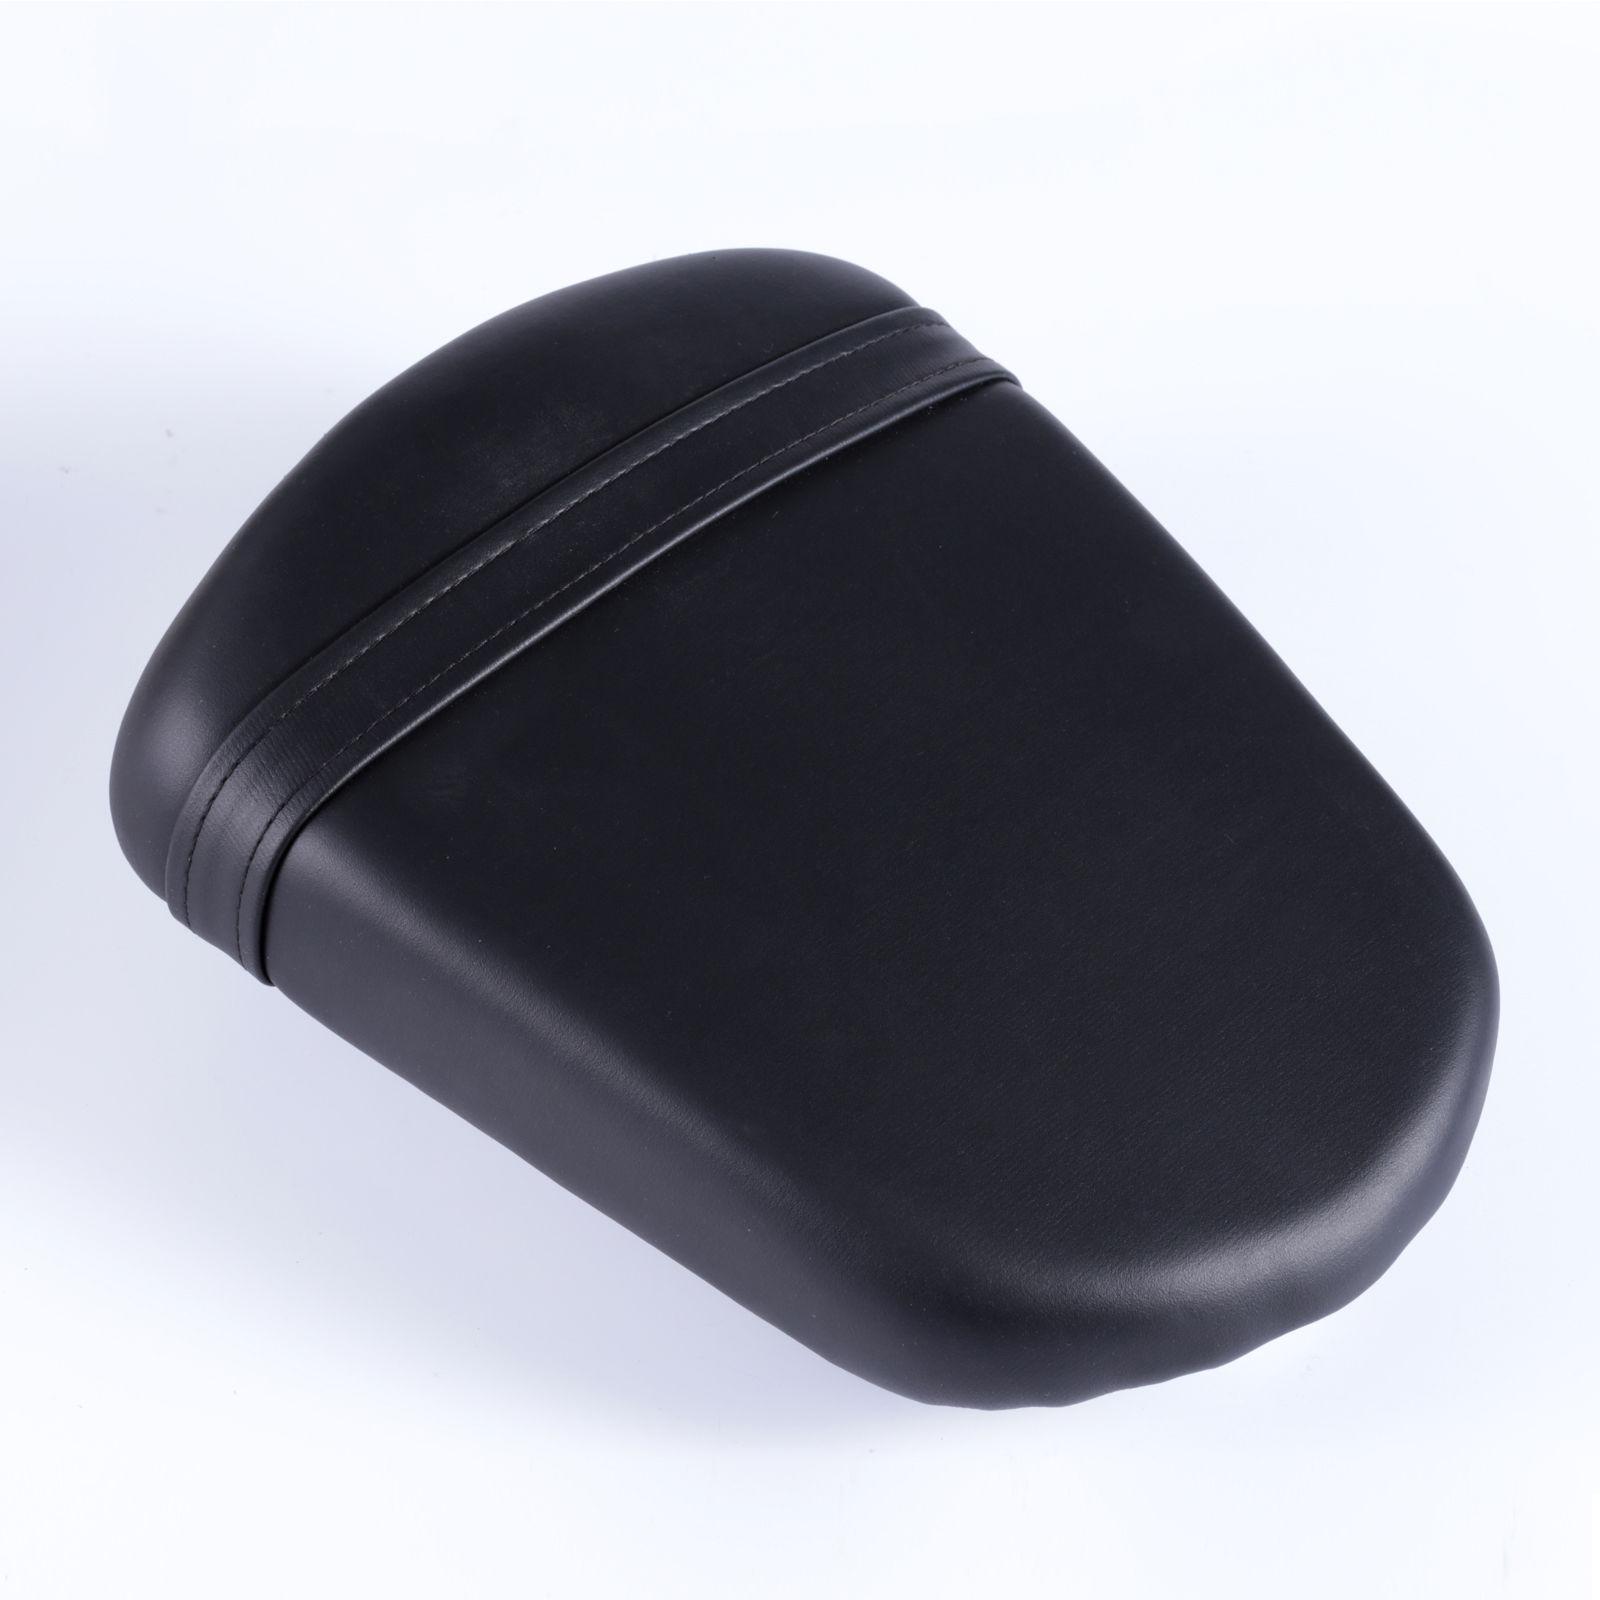 Free shipping Motorcycle Rear Passenger Seat Pillion Cover For SUZUKI GSXR600 GSXR750 K6 2006 2007 GSXR 600 750 06 07 new motorcycle ram air intake tube duct for suzuki gsxr600 gsxr750 2006 2007 k6 abs plastic black